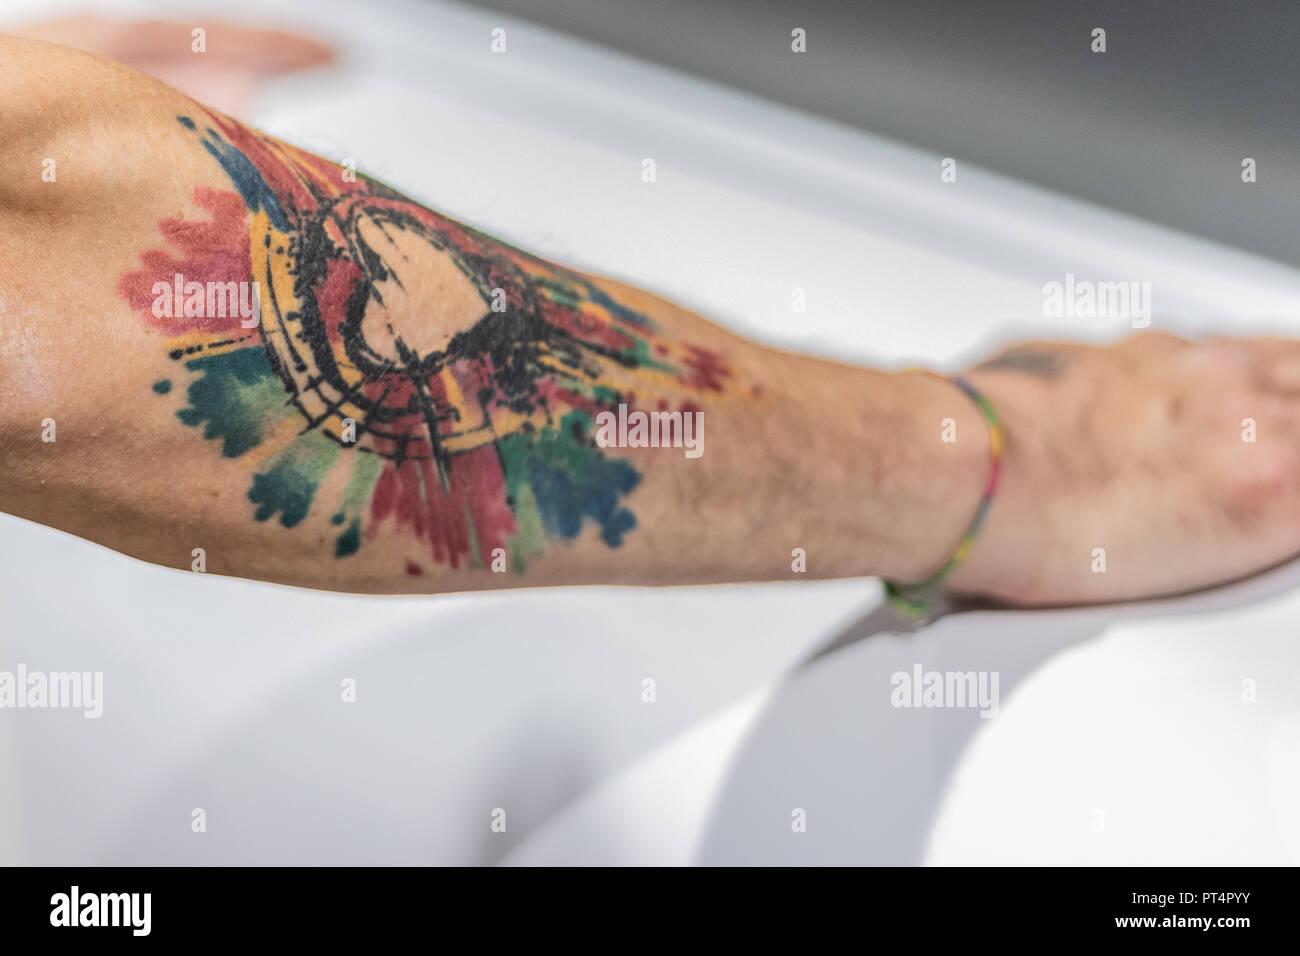 Tattoo Rome Stockfotos Tattoo Rome Bilder Alamy